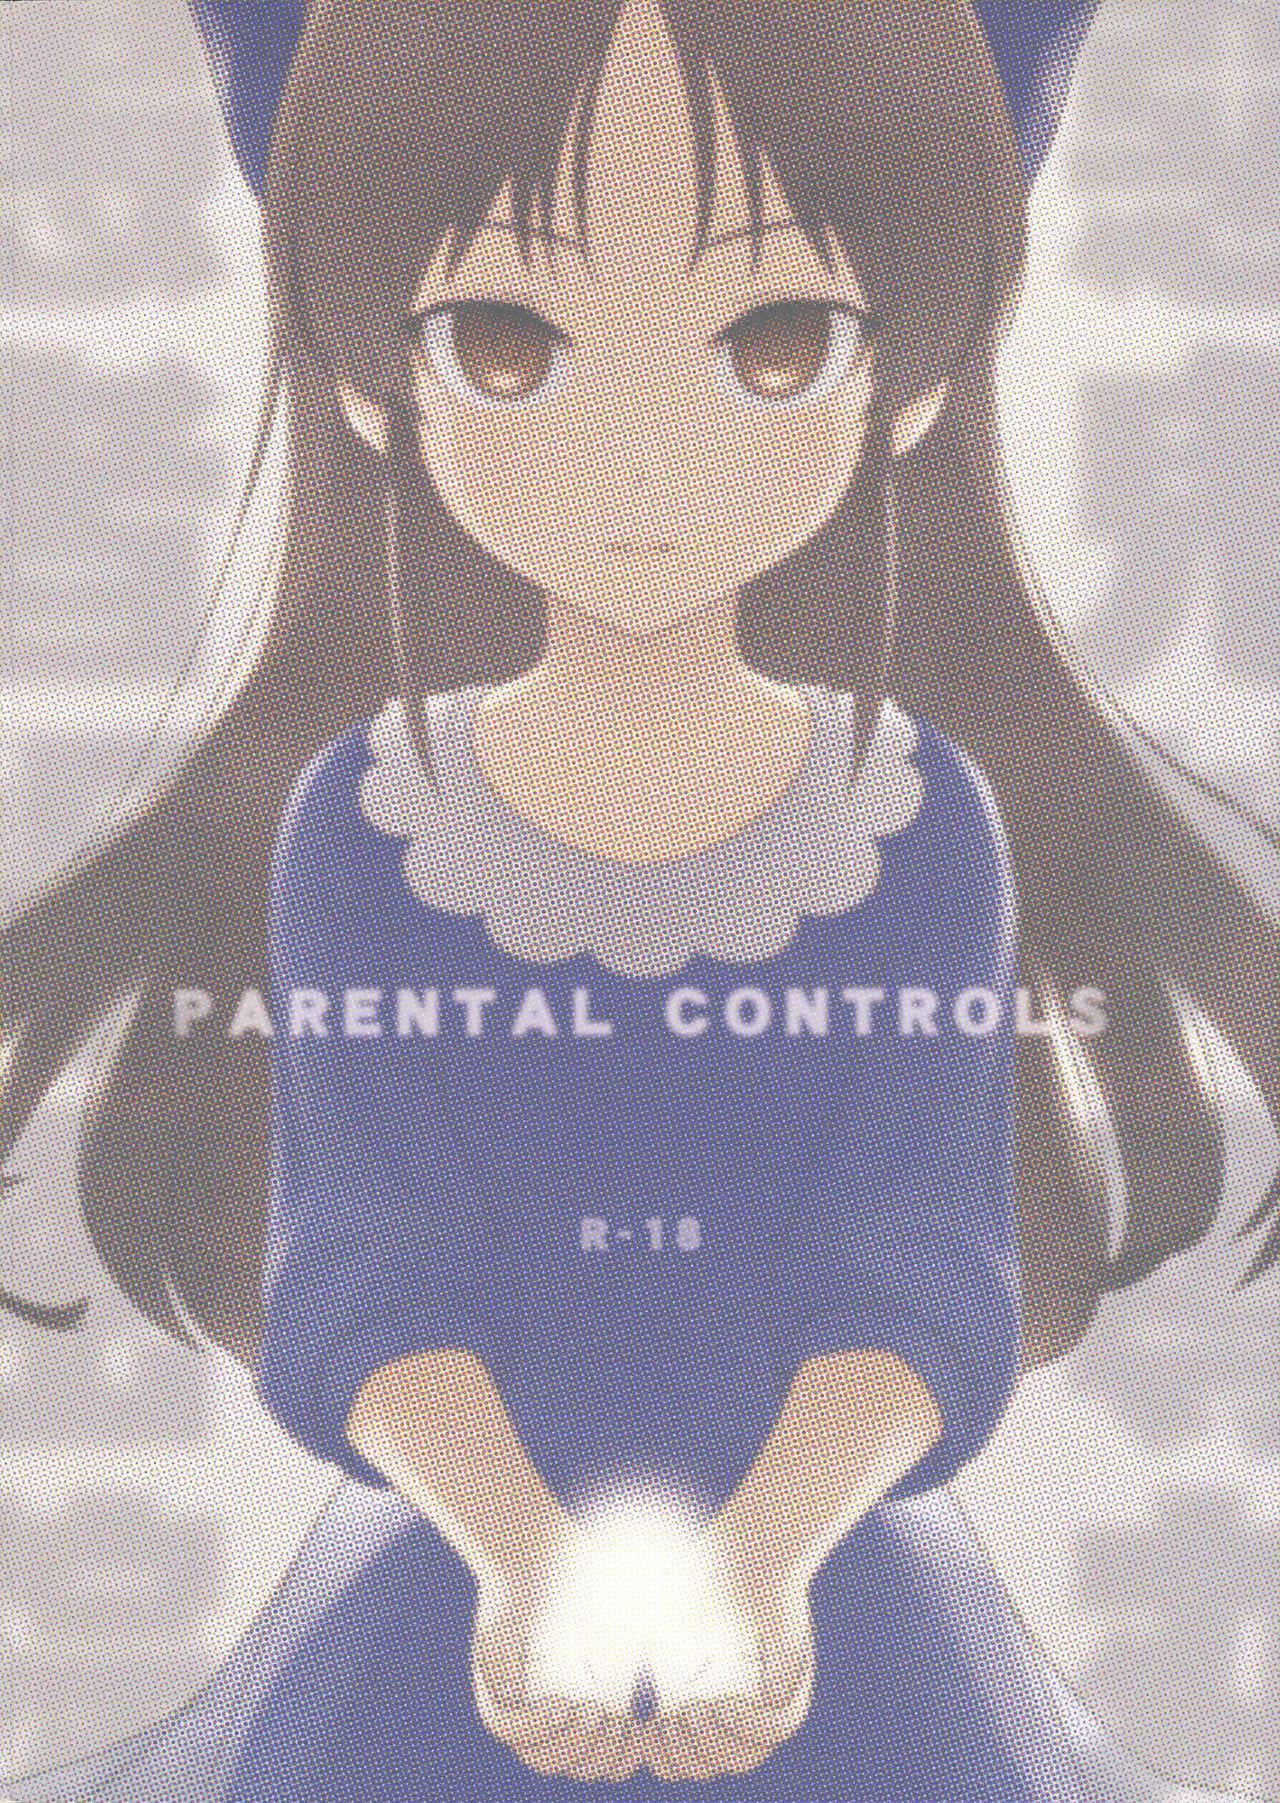 PARENTAL CONTROLS 33